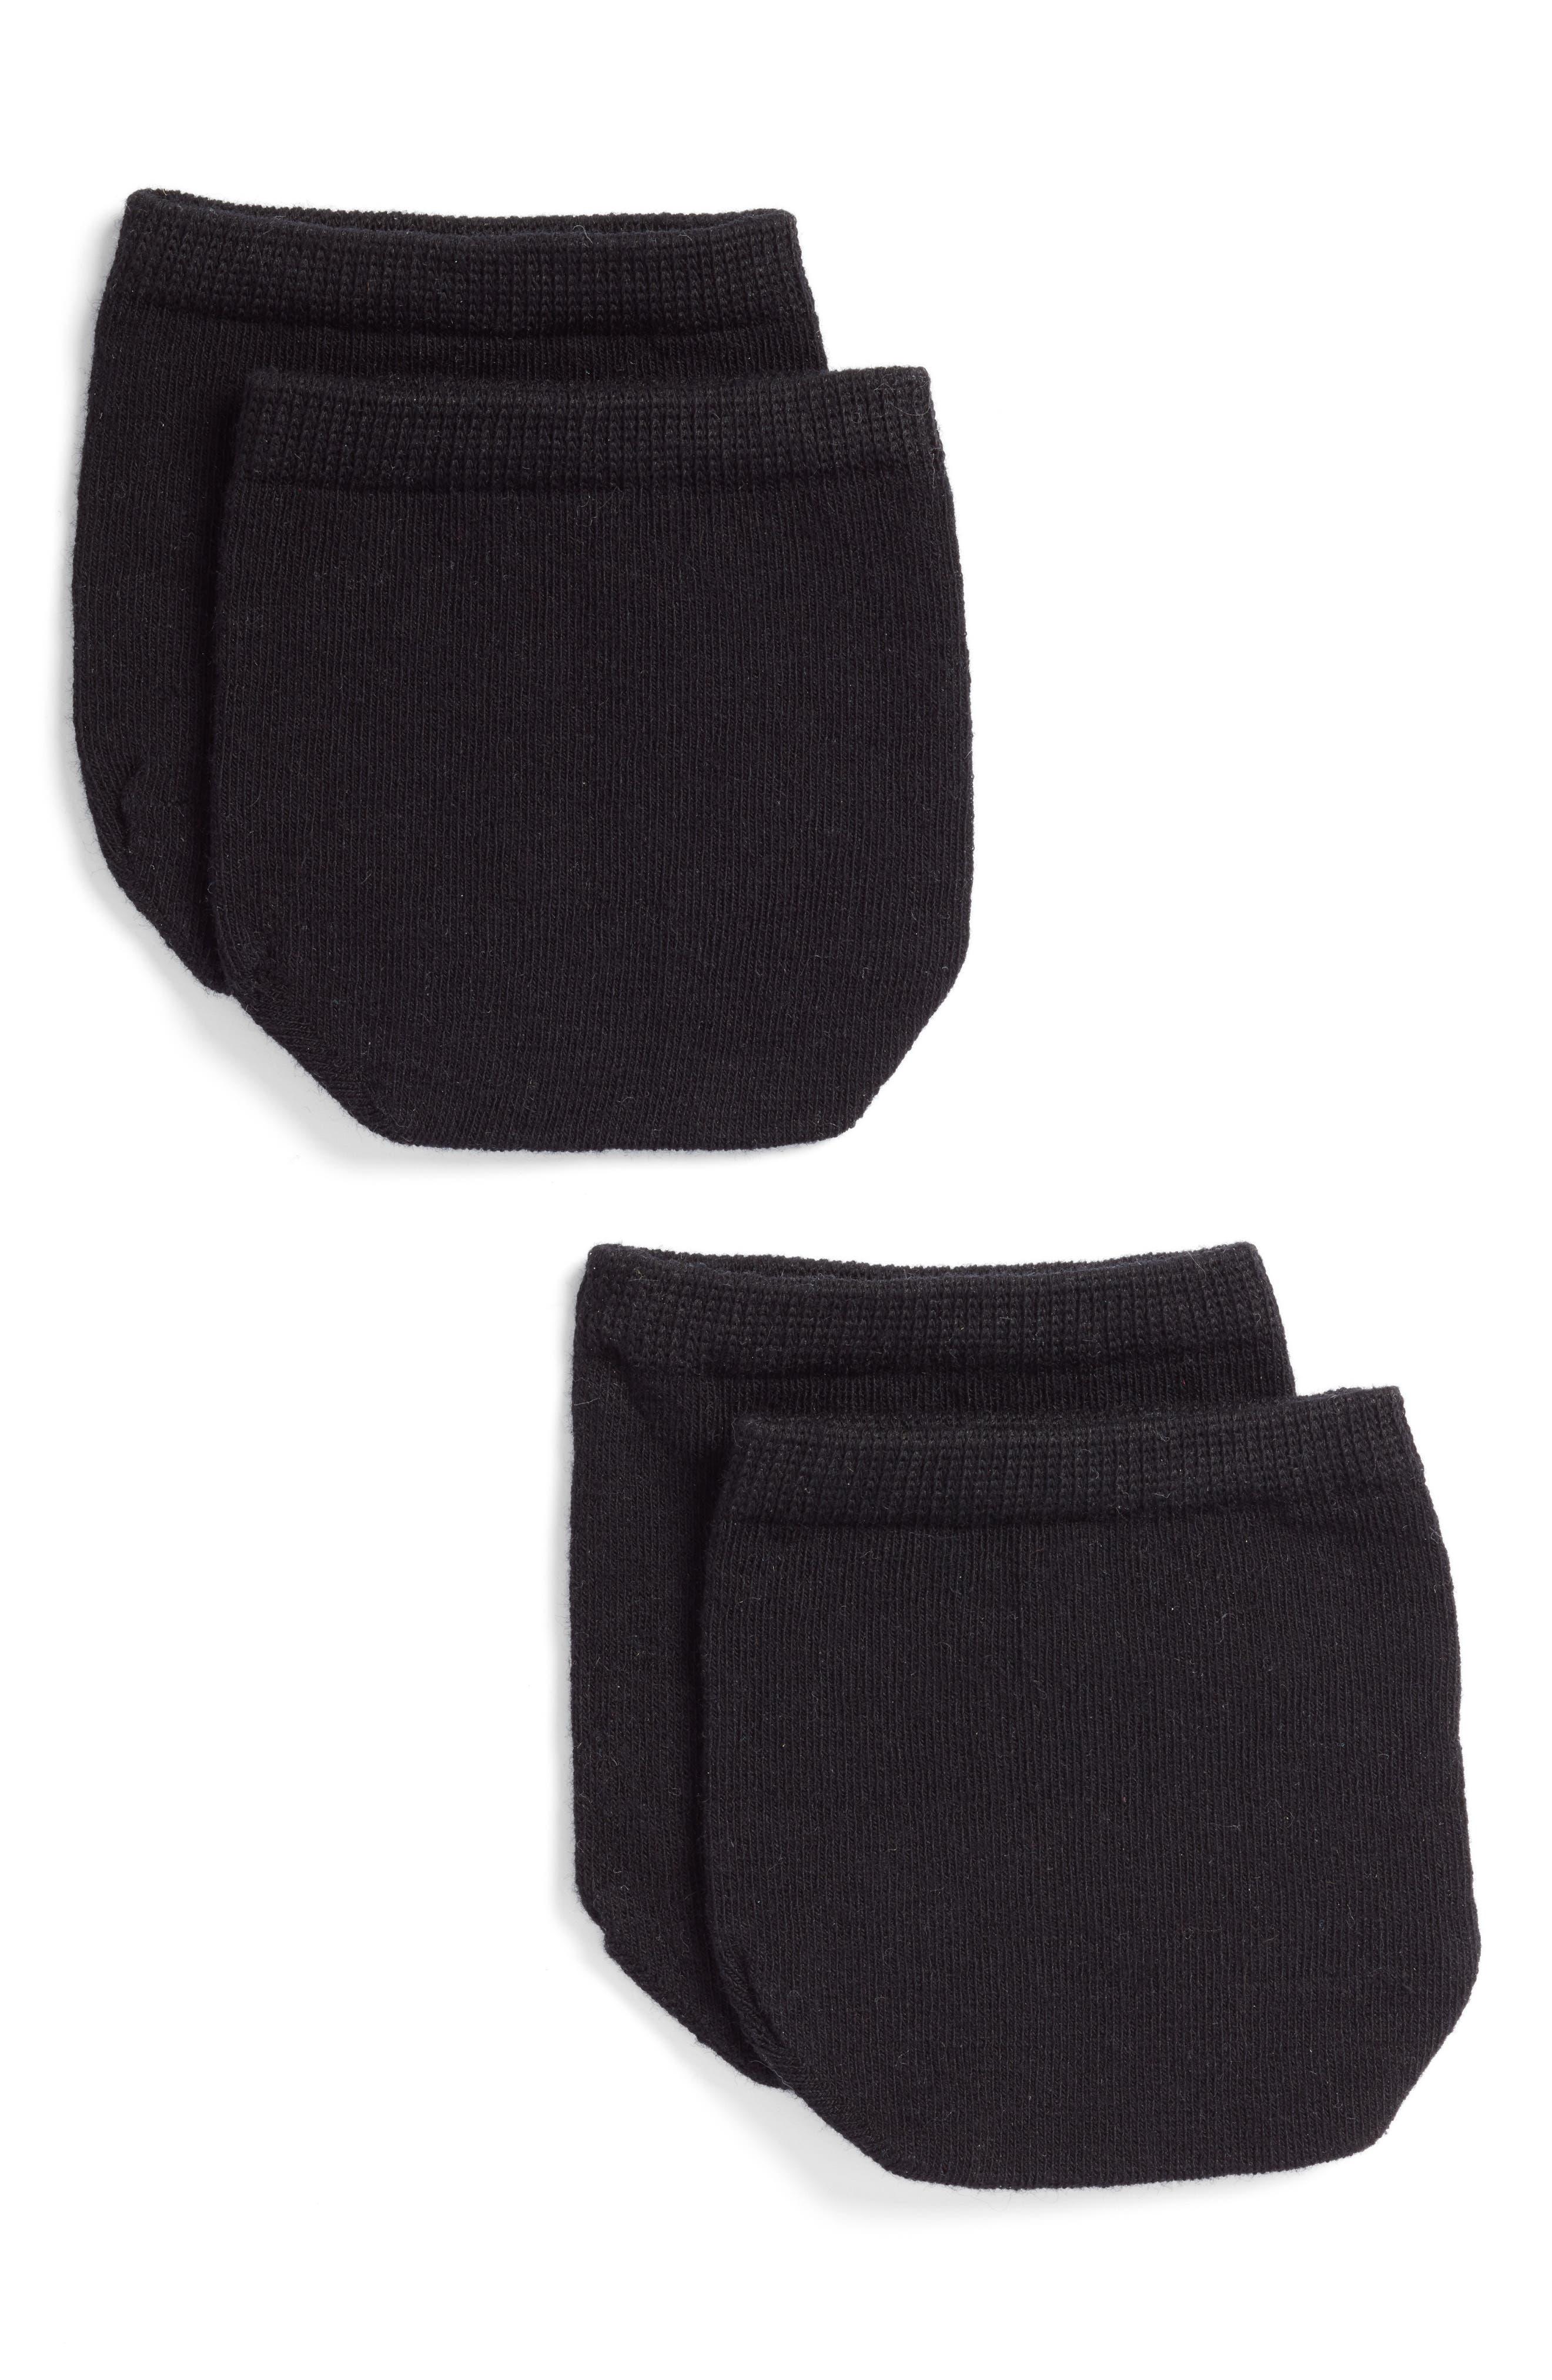 Alternate Image 2  - SOCKART 2-Pack Mule Socks